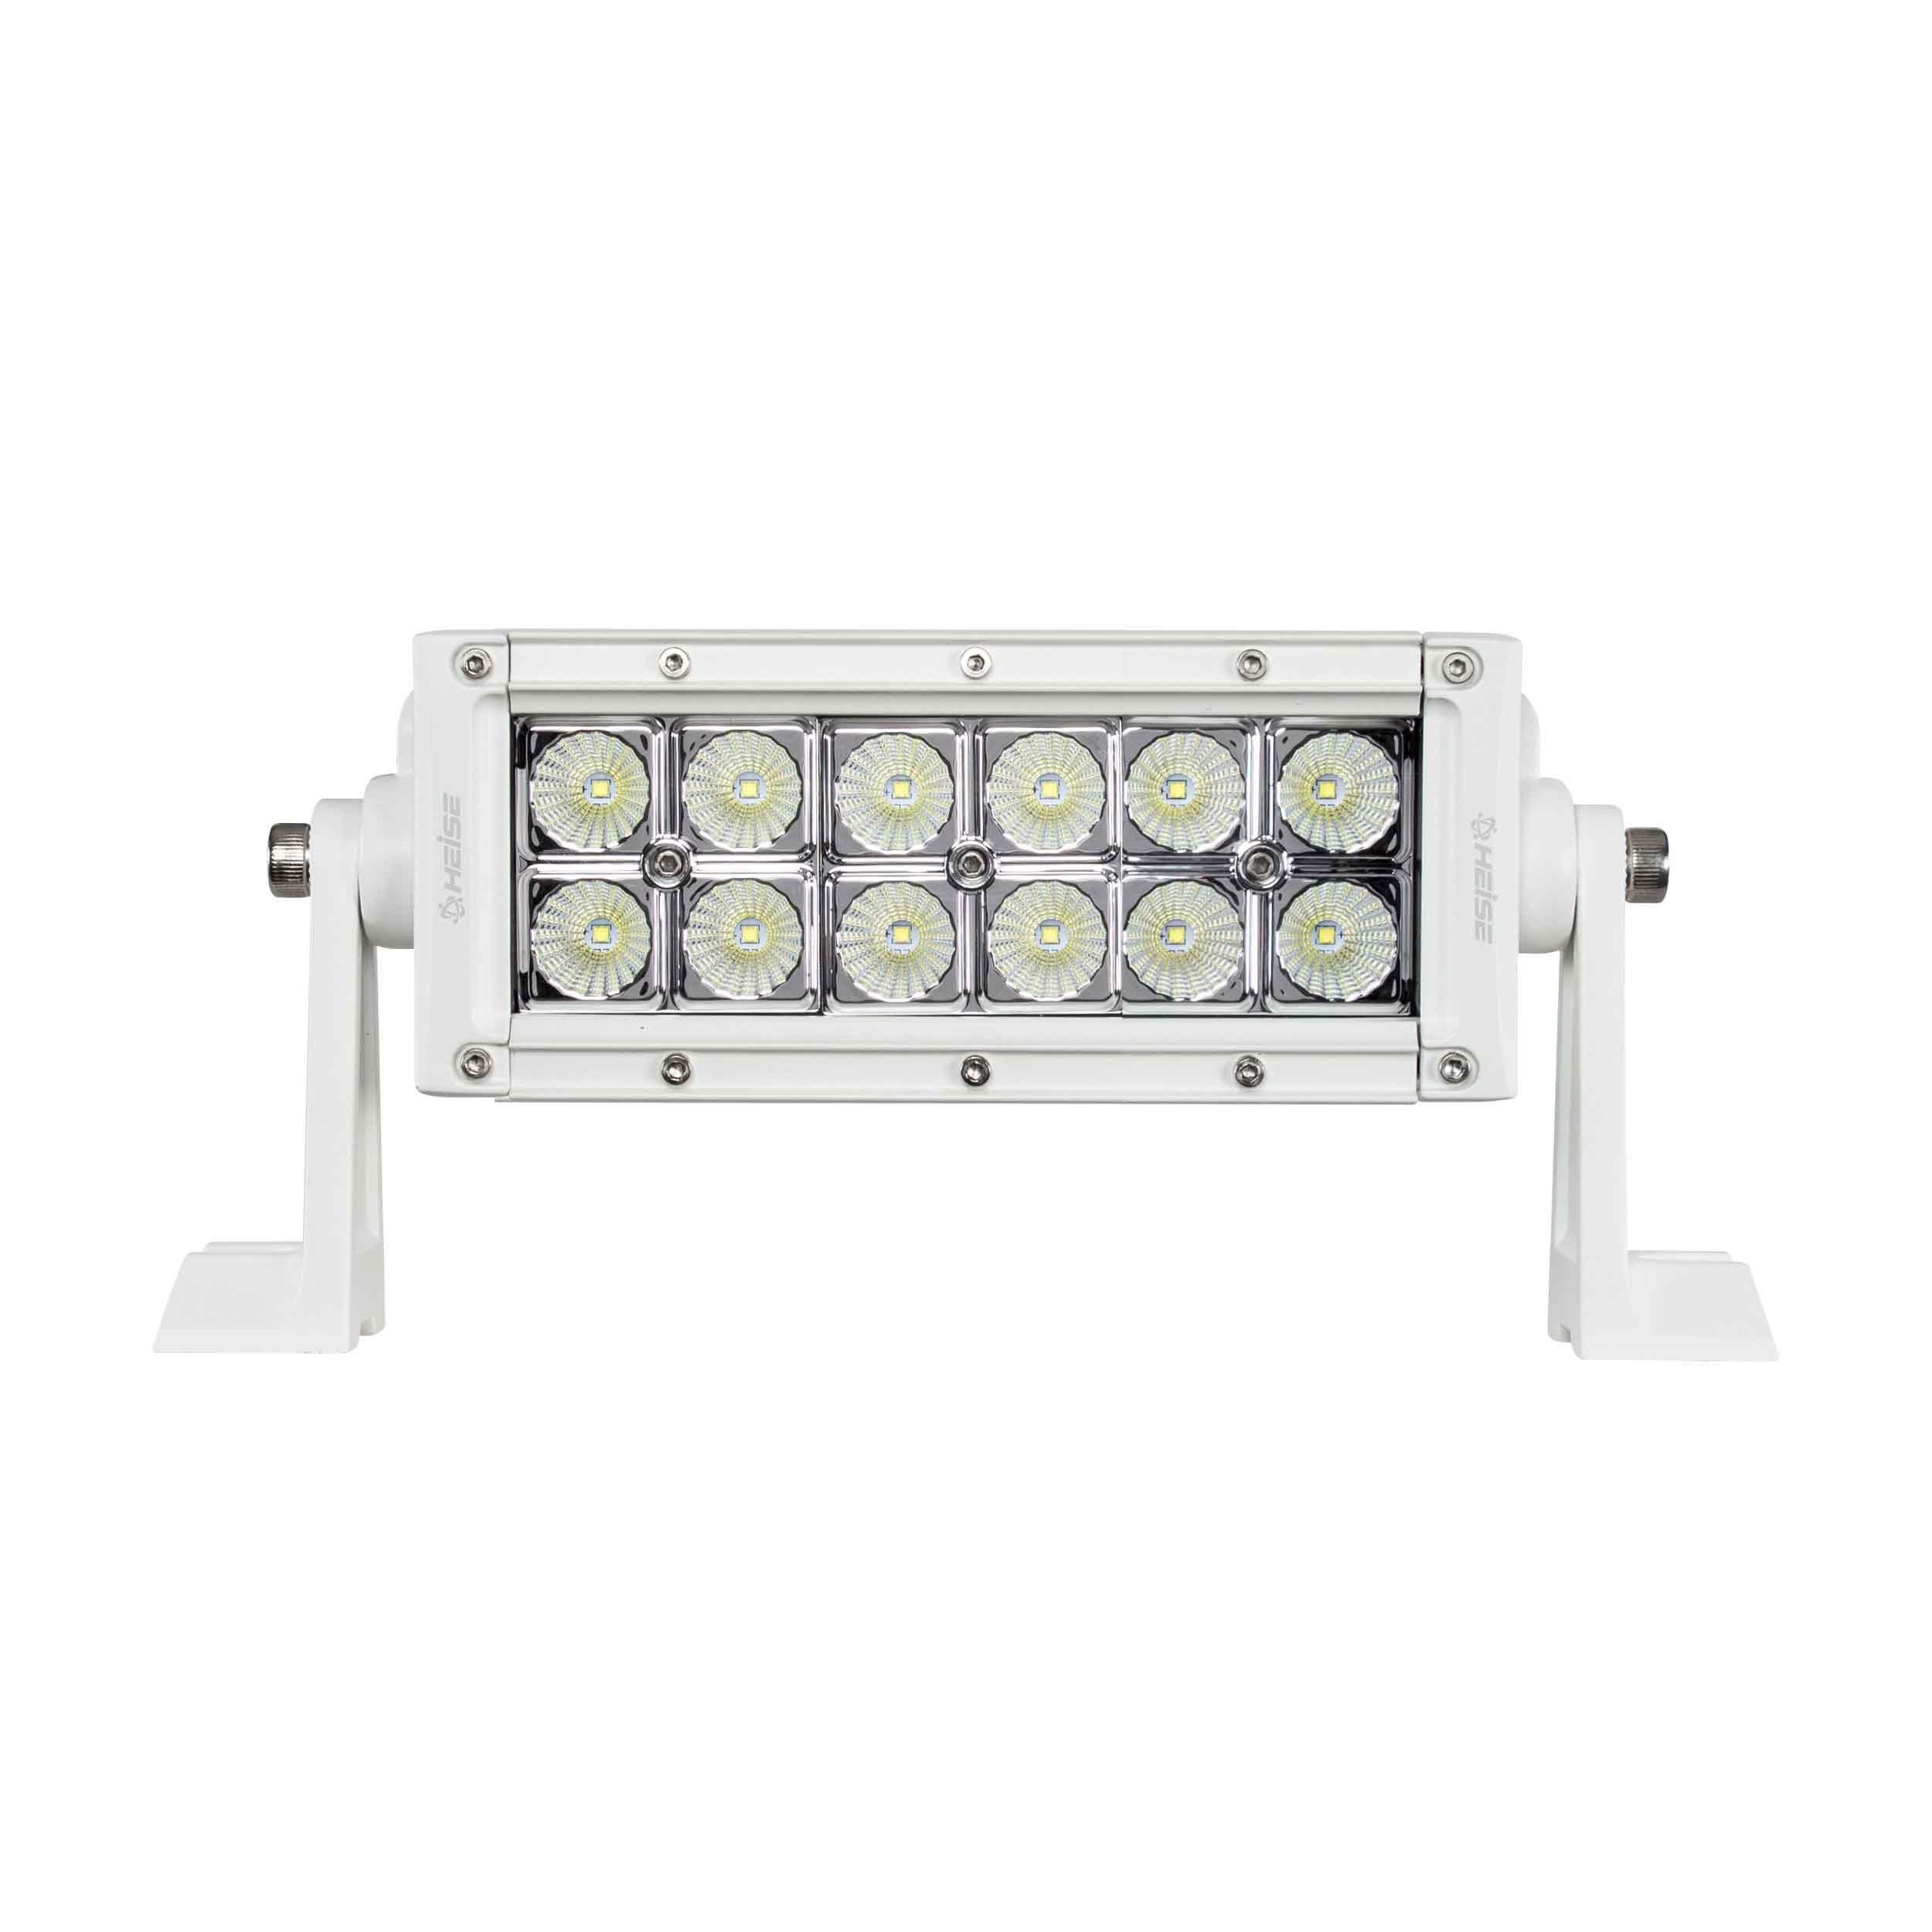 Dual Row Marine Lightbar - 8 Inch